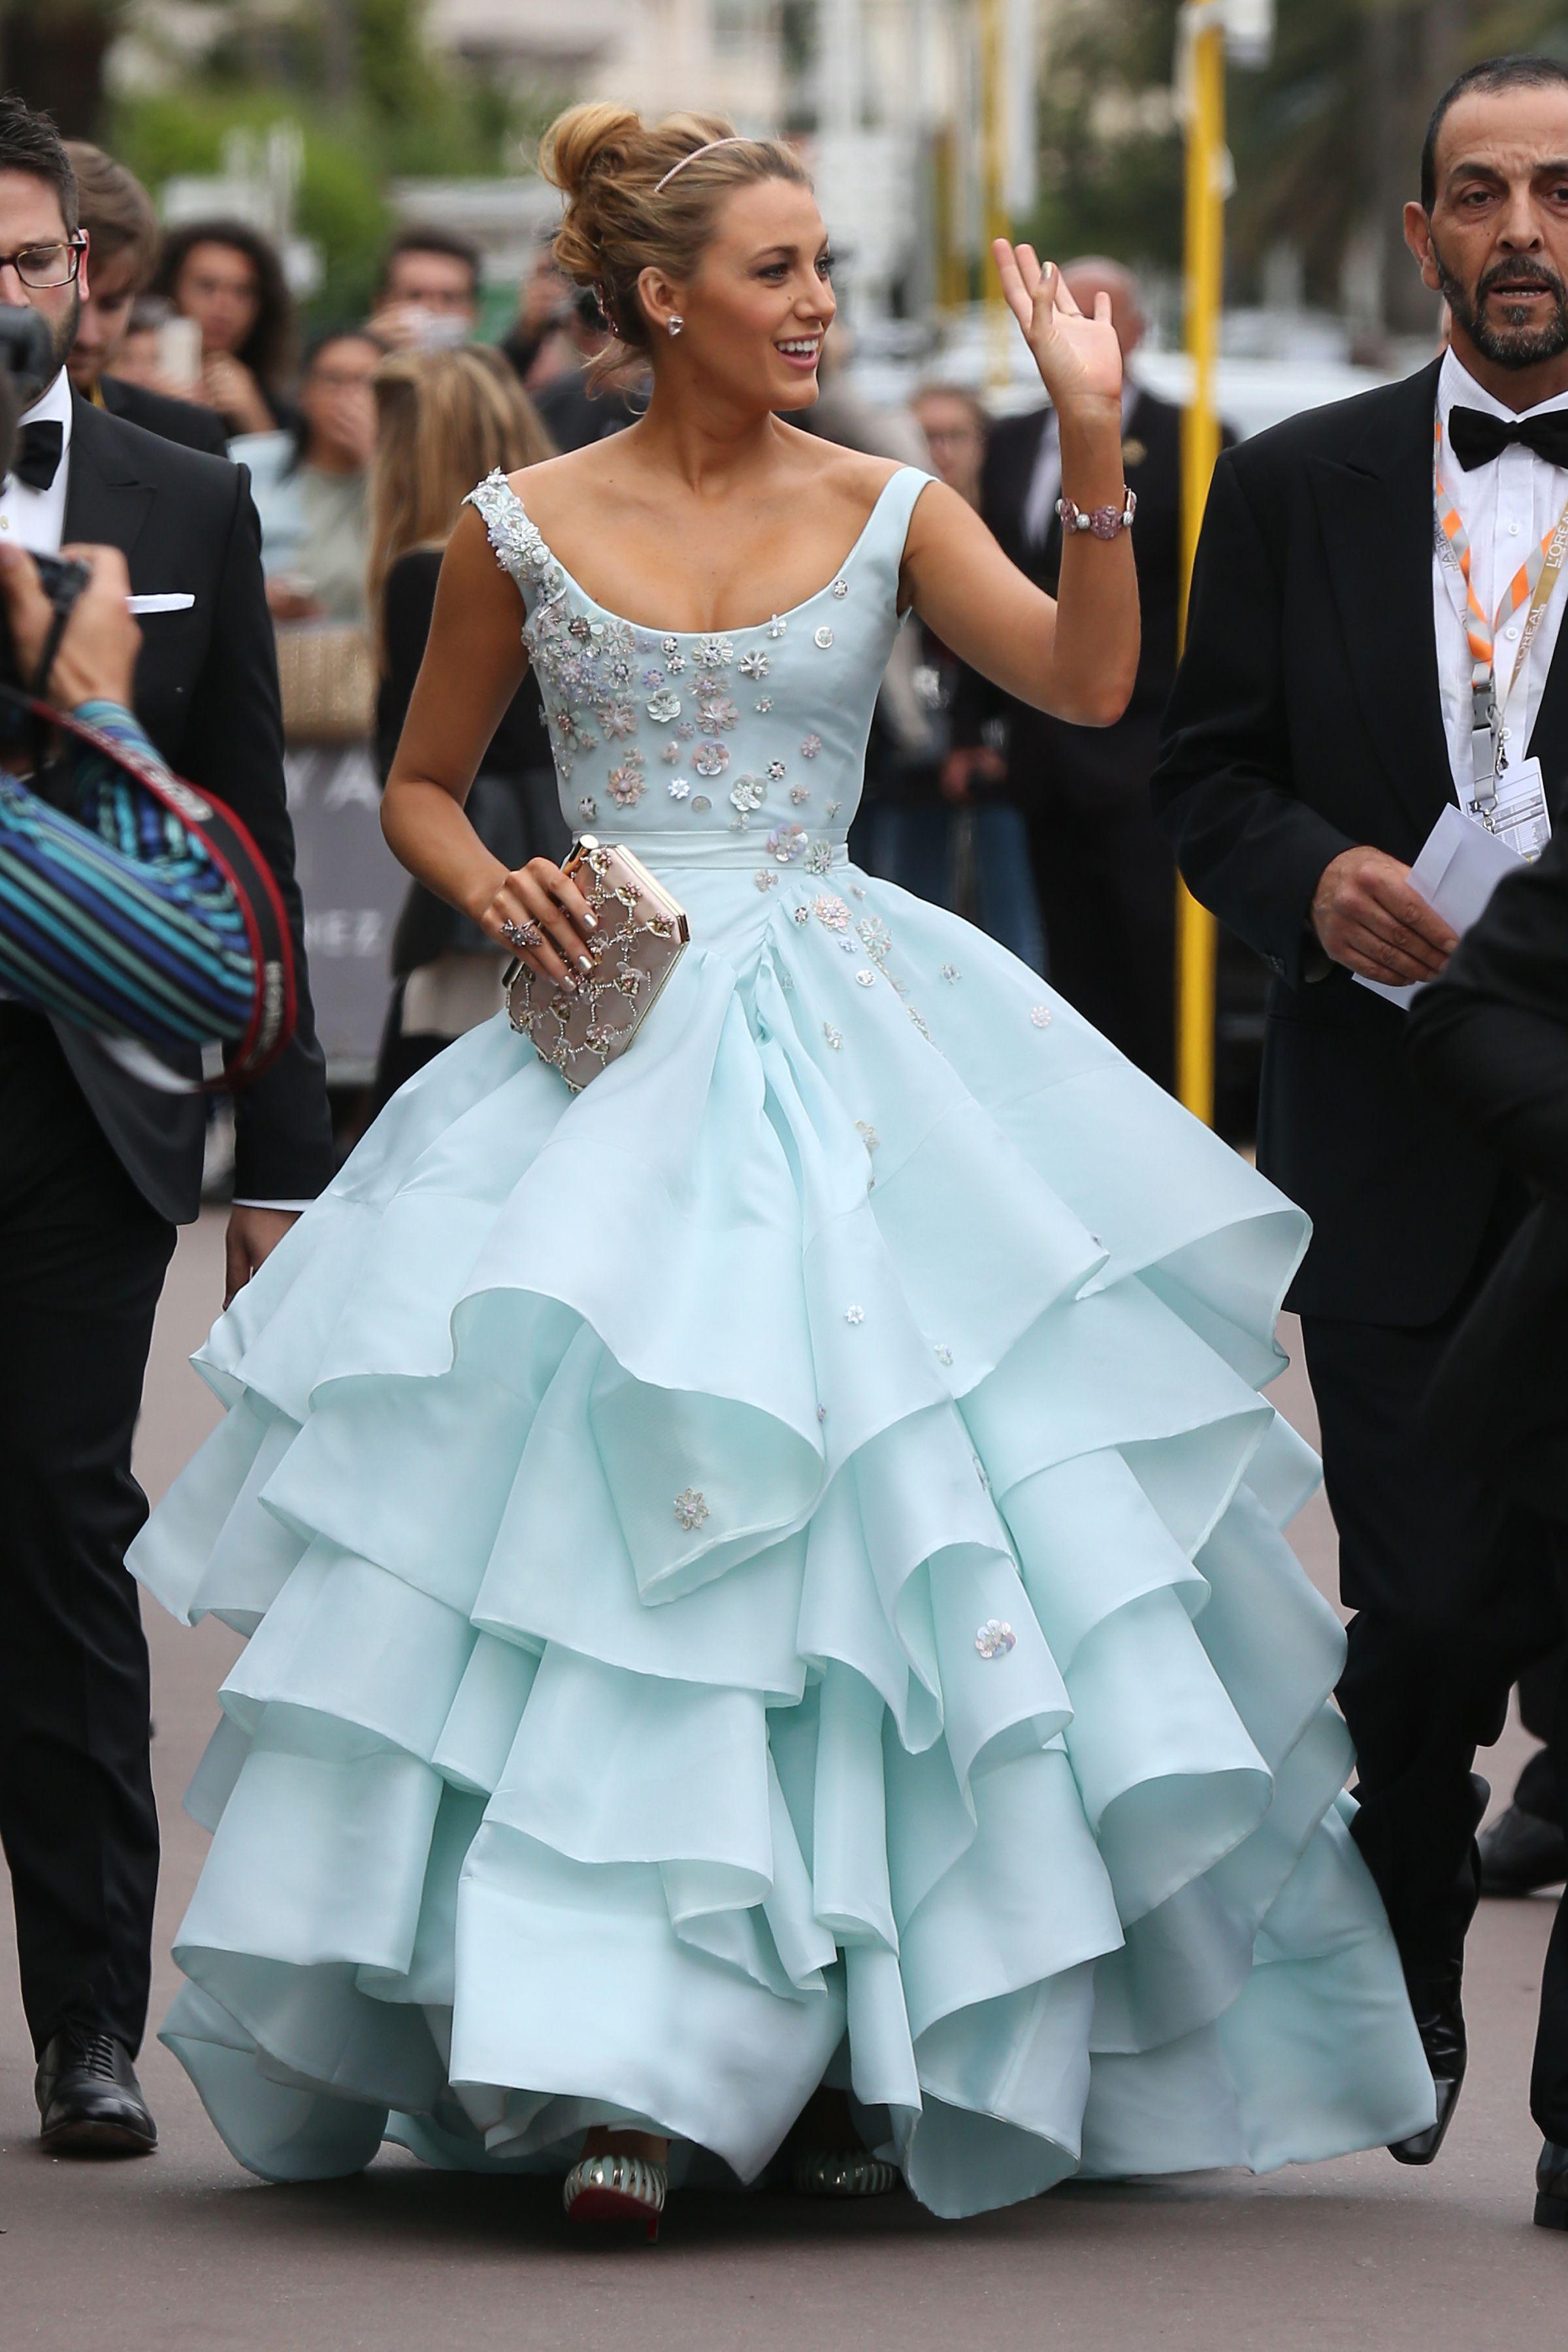 50+ Times Celebrities Dressed Exactly Like Disney Princesses | Blake ...